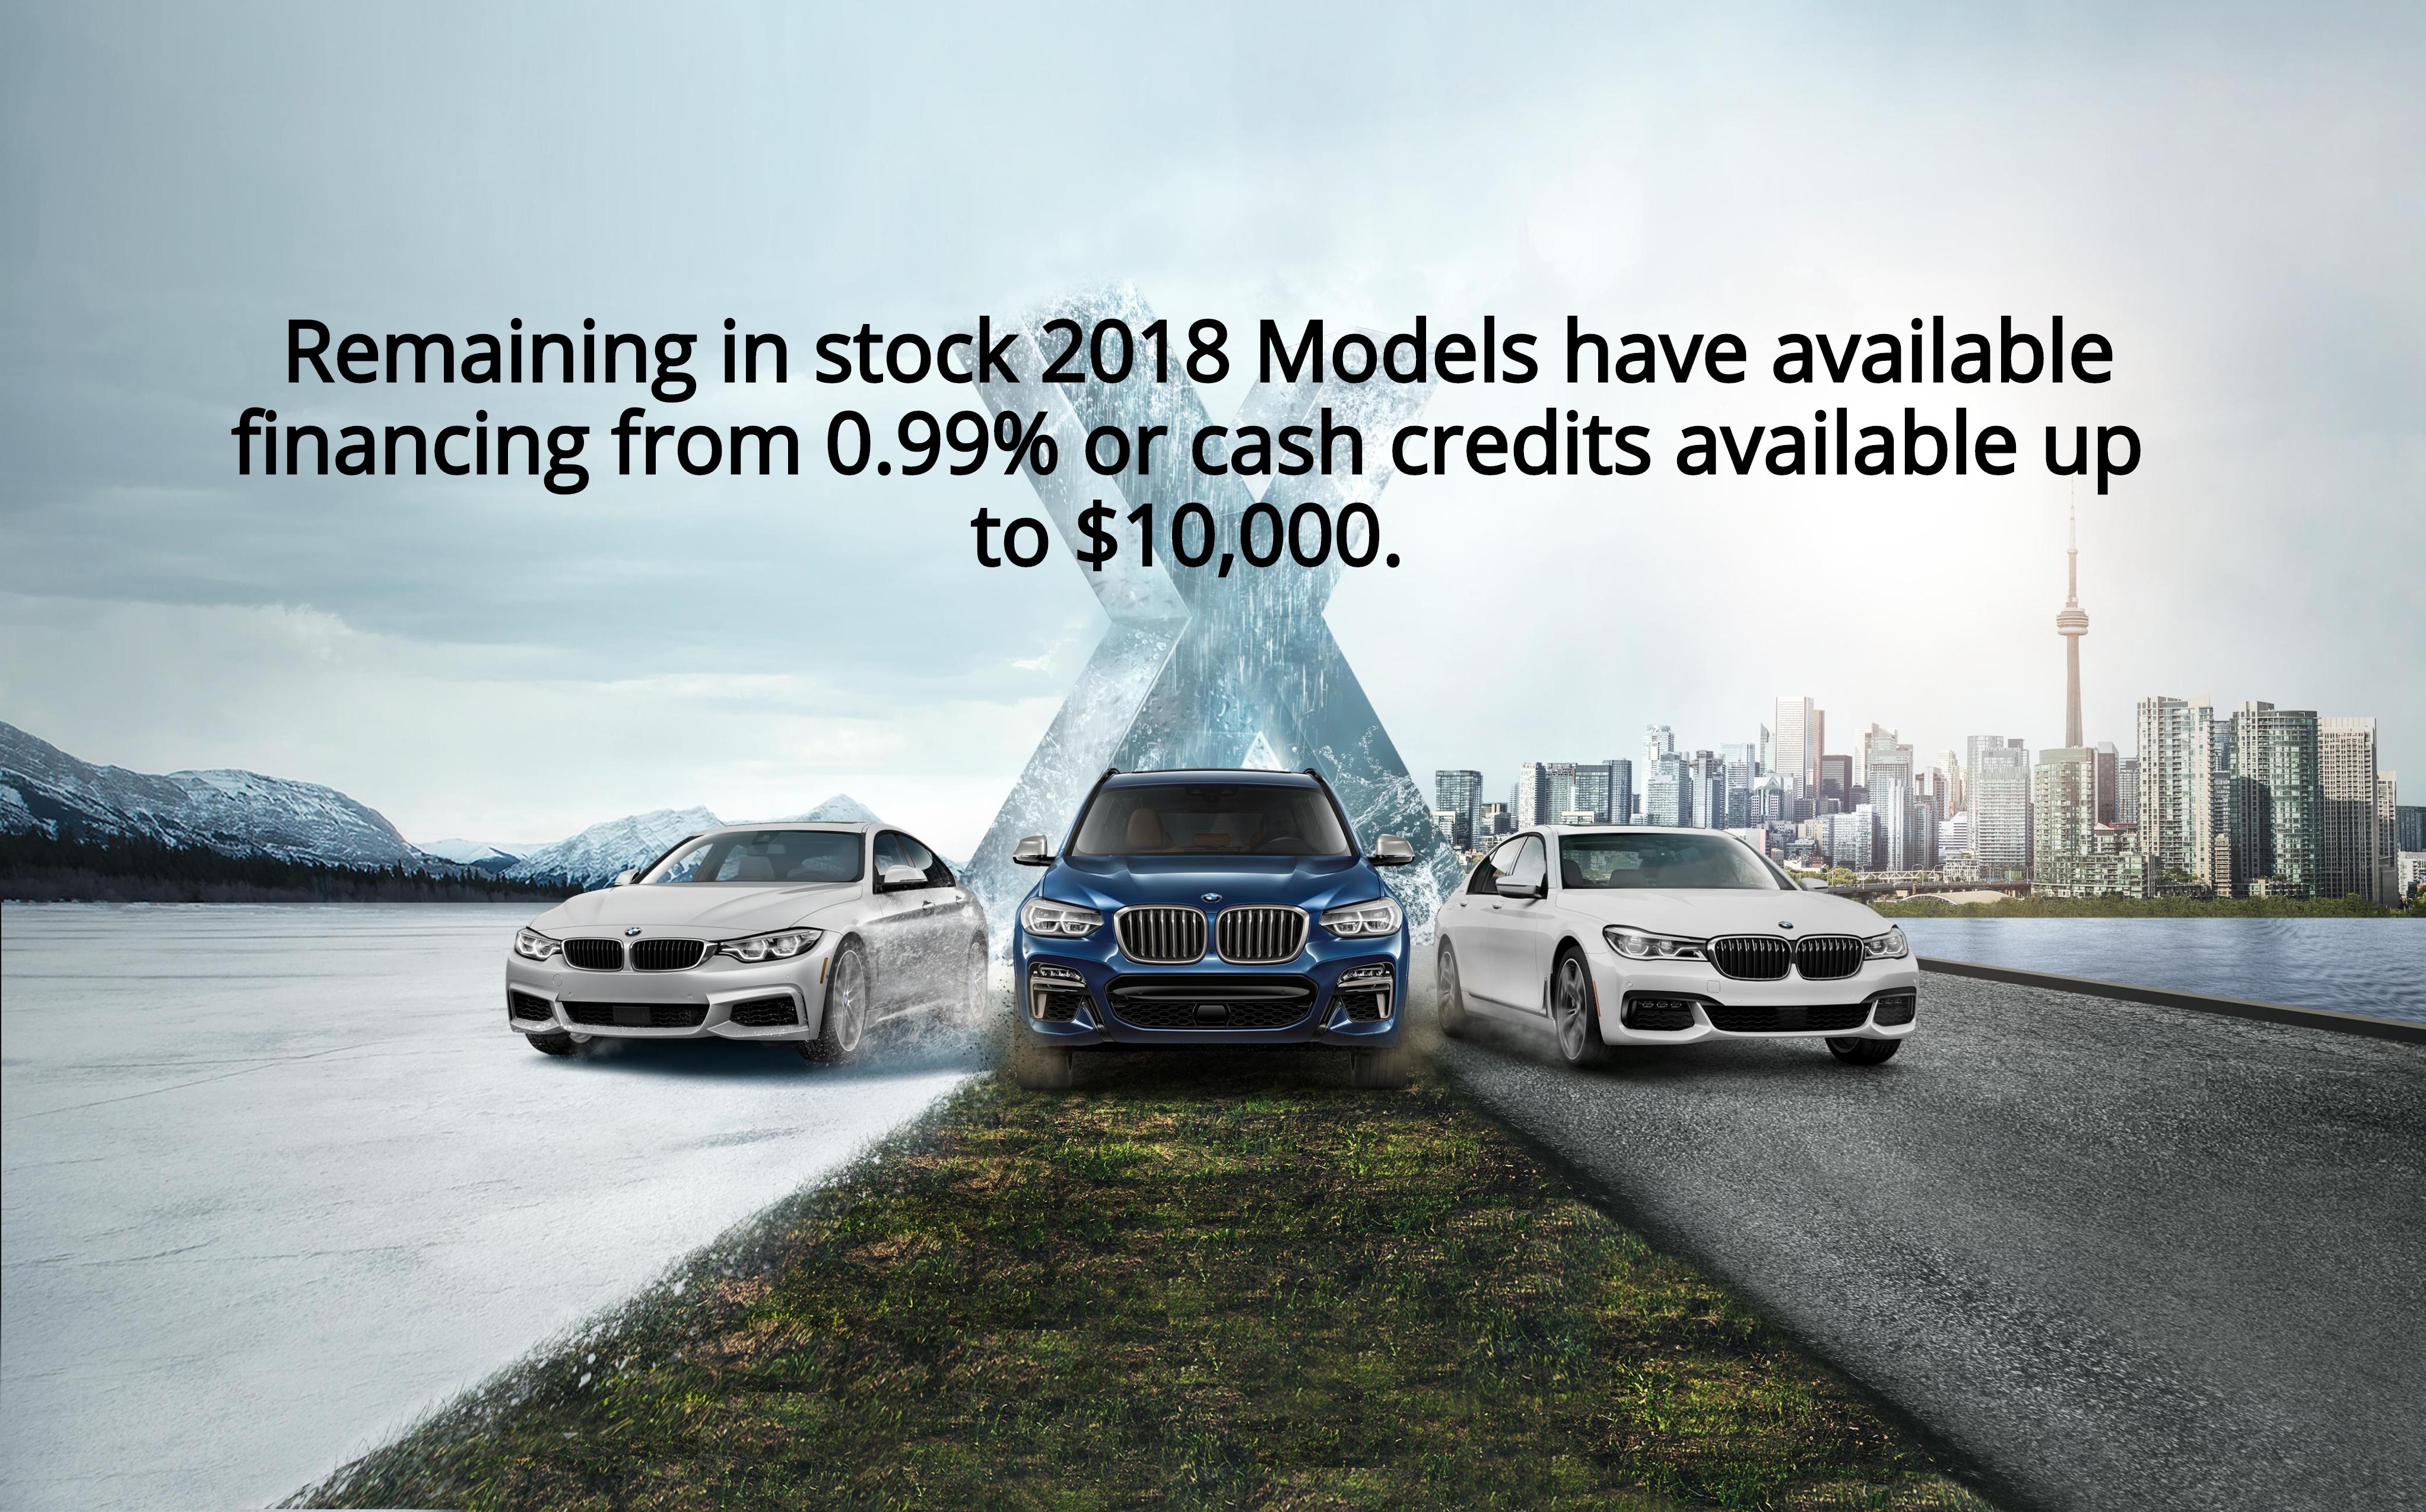 BMW_GTA_Sale_uncropped_3cars (wecompress.com) (3)